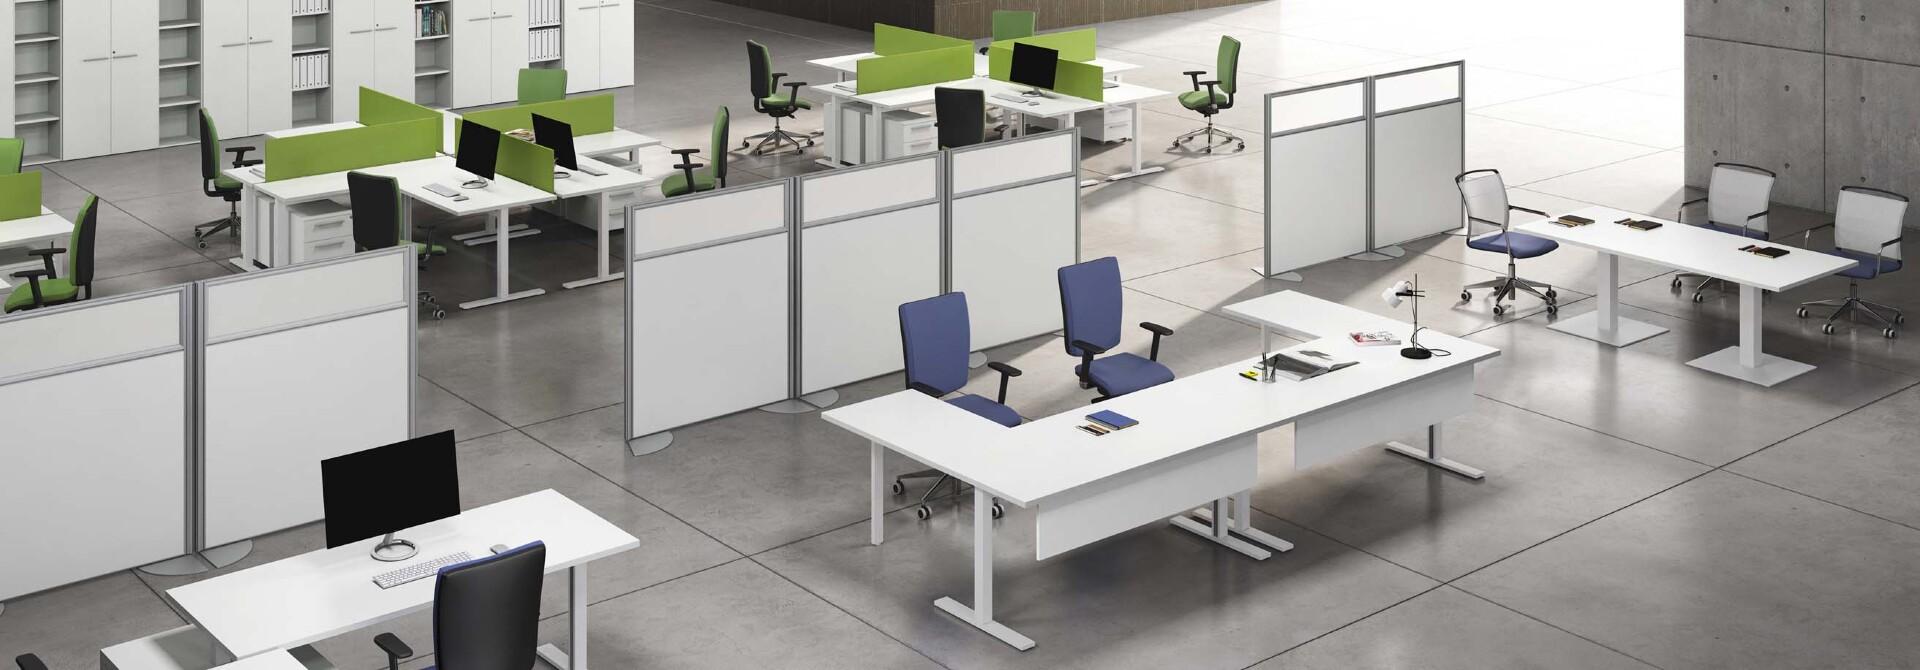 ambiente-lavoro-call-center-g1.jpg